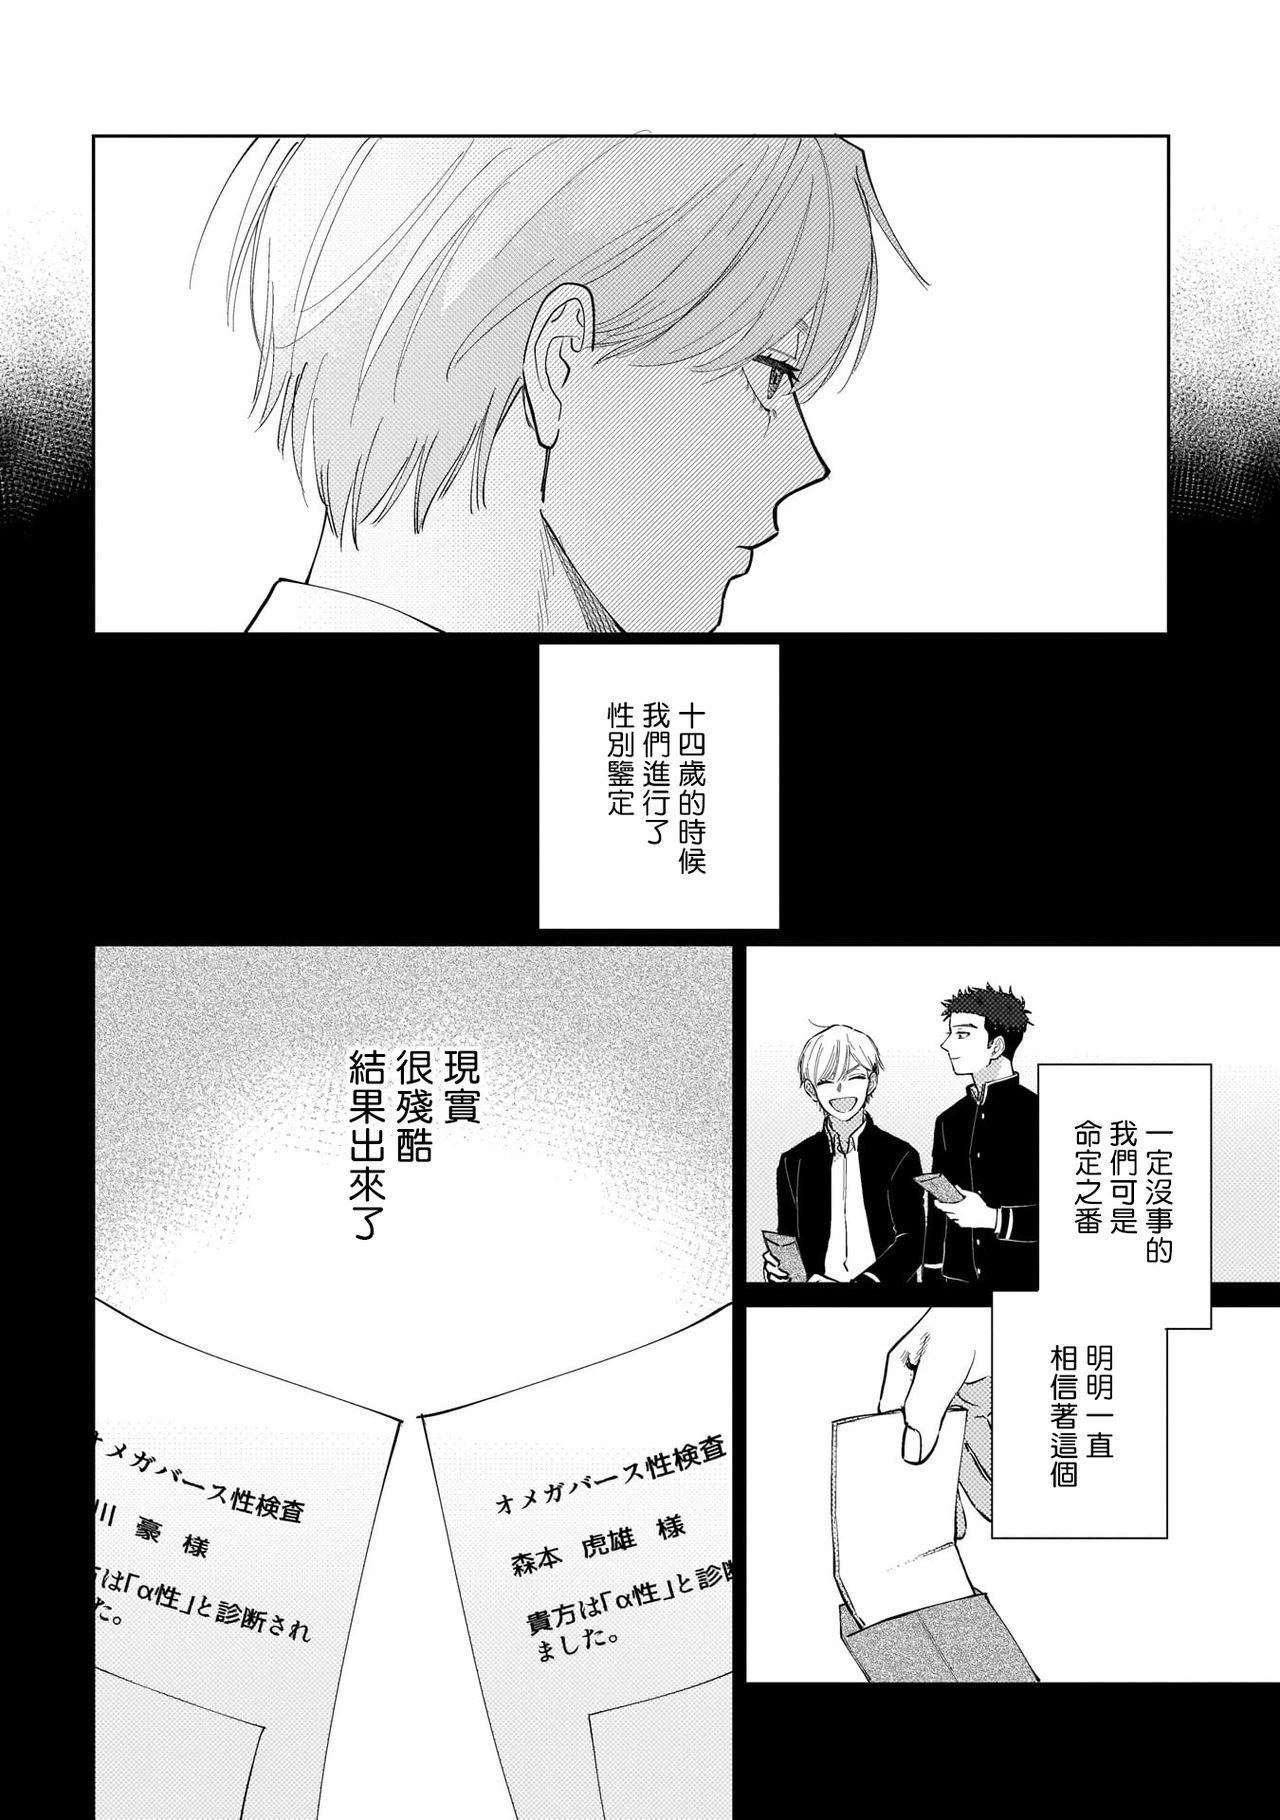 Bokura wa Unmei Janai | 我们不是命定之番 1-3 9